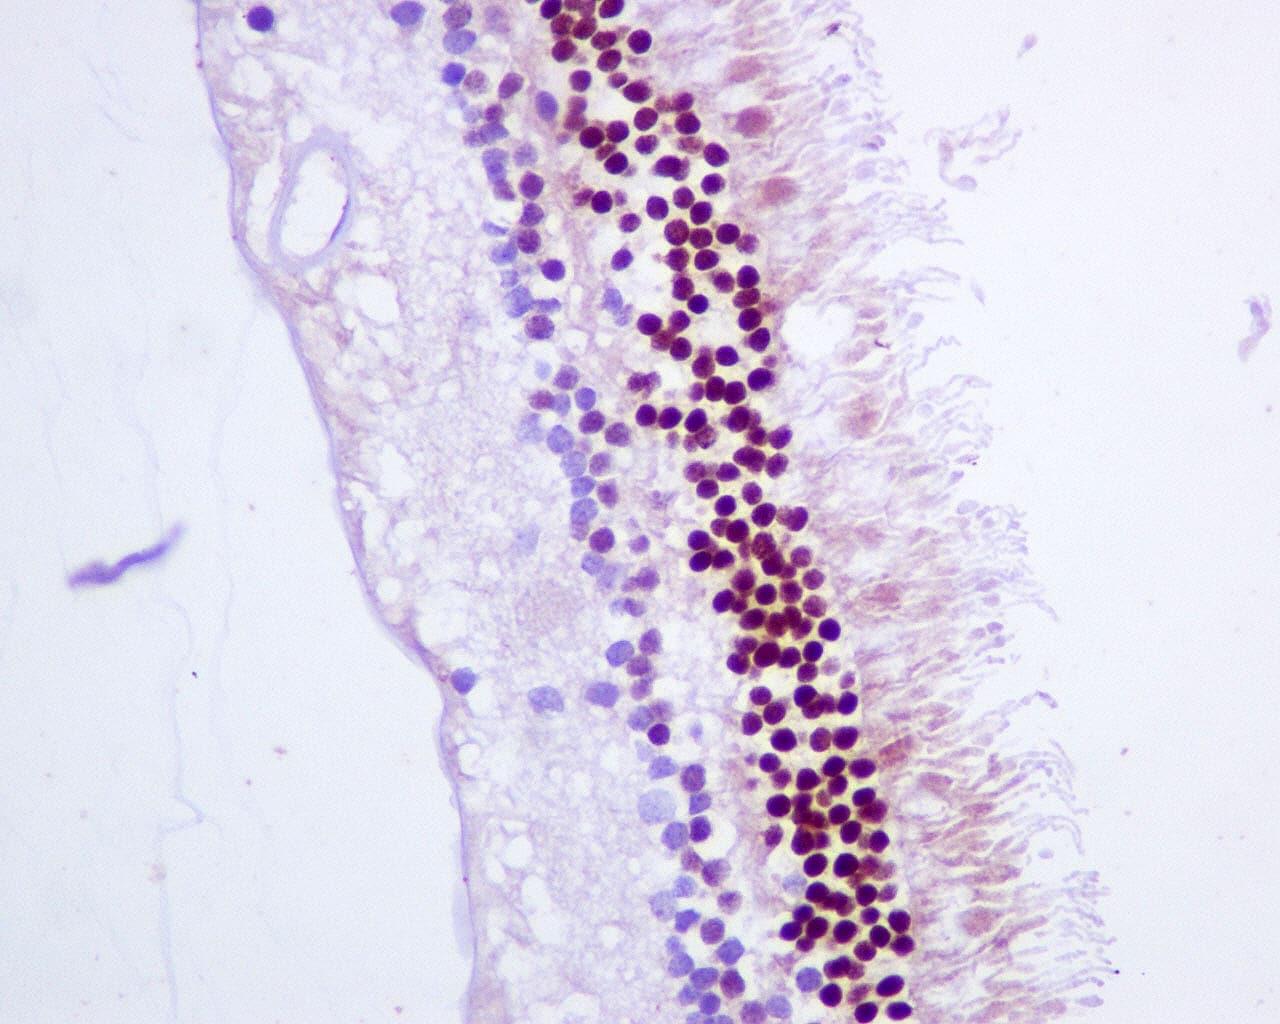 Immunohistochemistry (Formalin/PFA-fixed paraffin-embedded sections) - Anti-CRX antibody [EPR9582] (ab140603)